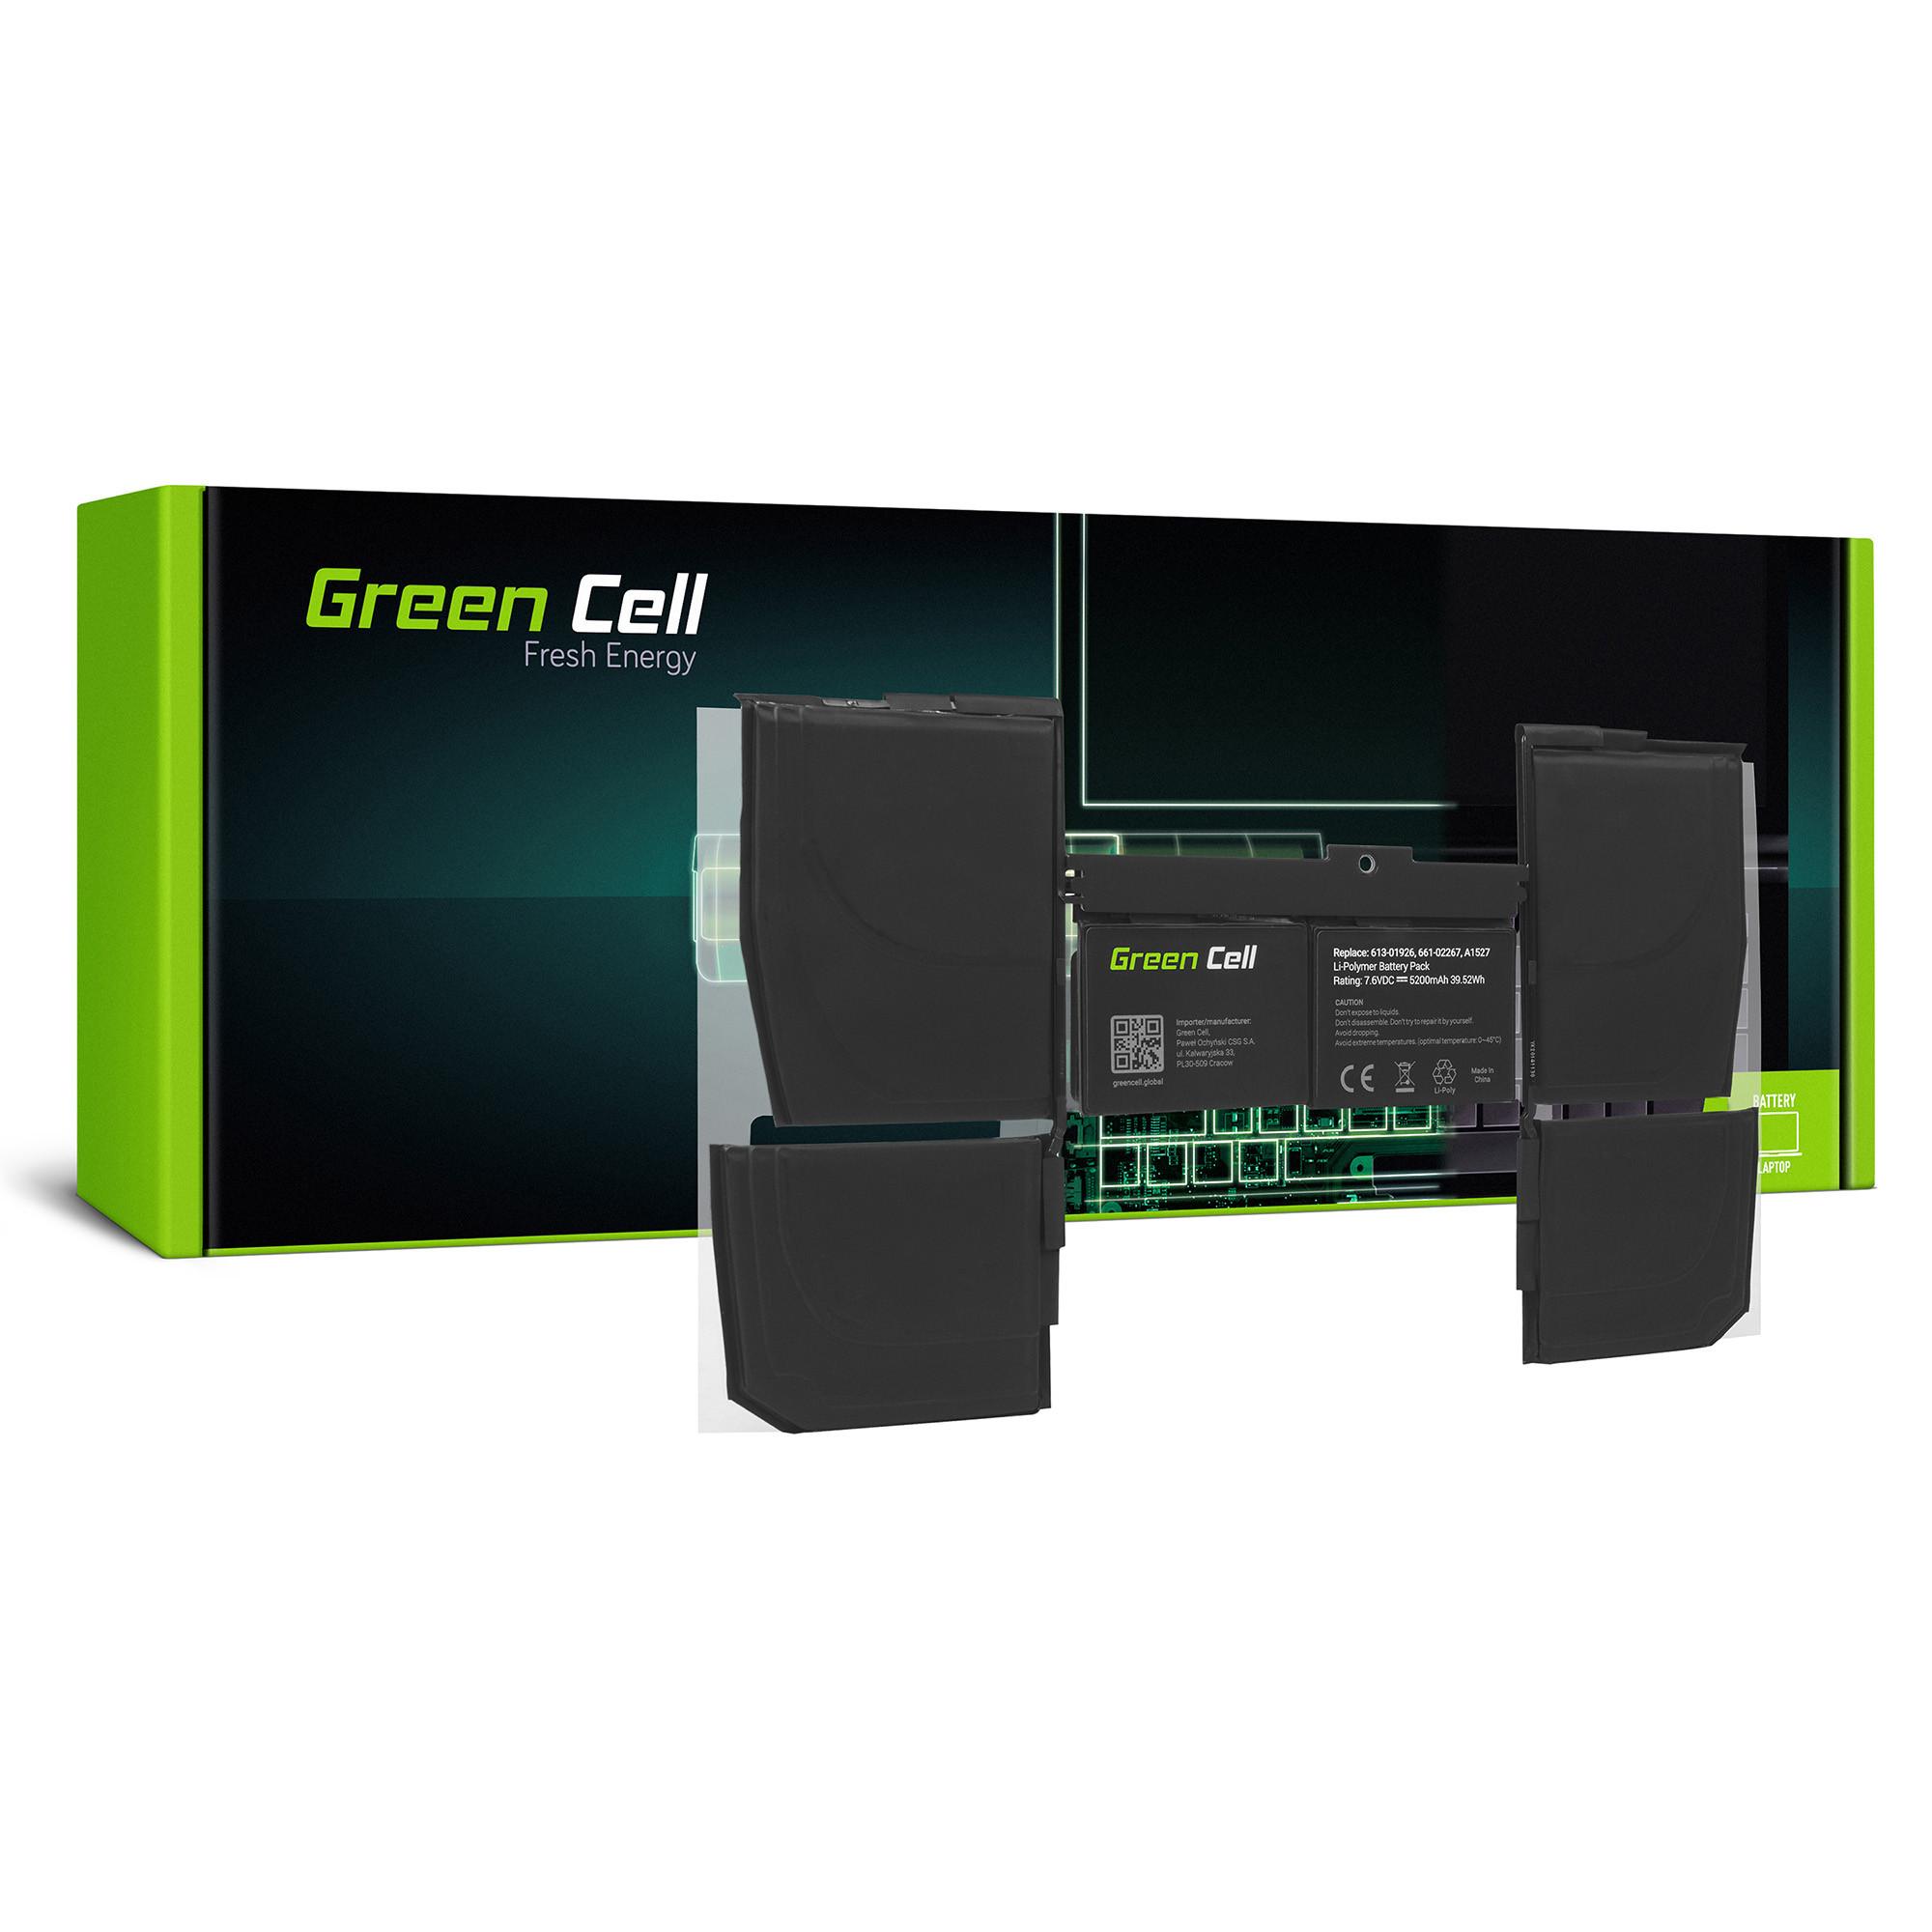 Green Cell AP27 Baterie Apple A1527 Apple MacBook 12 A1534 (Early 2015, Early 2016, Mid 2017) 40Wh Li-Pol – neoriginální